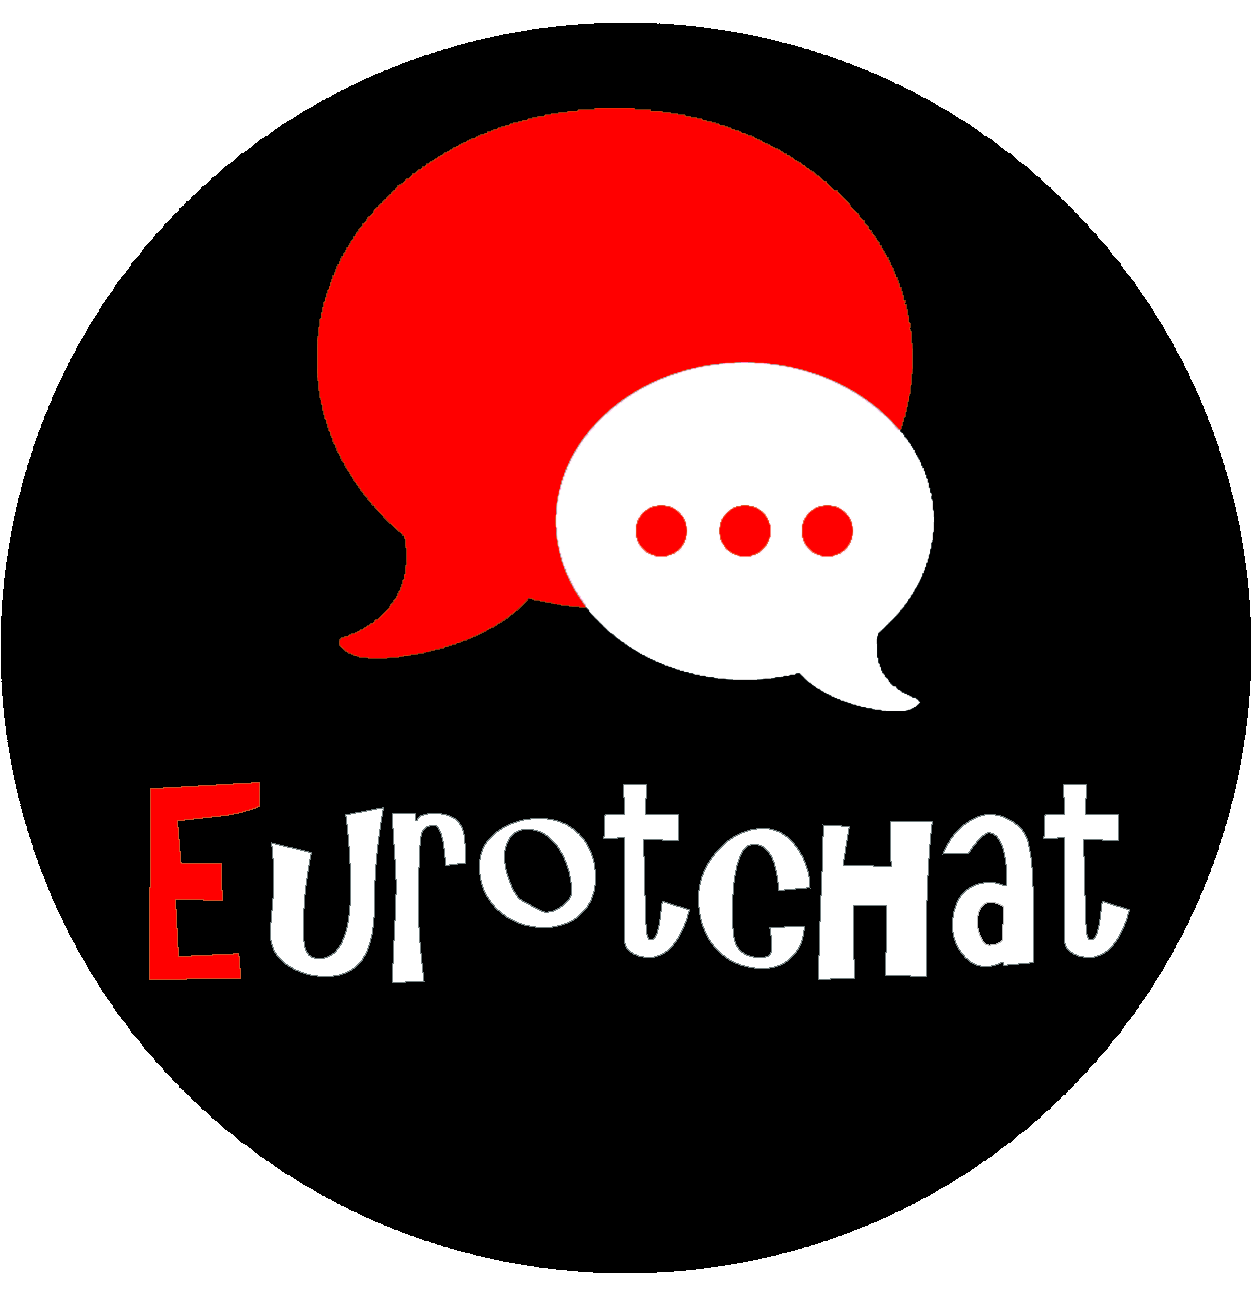 EuroTchat